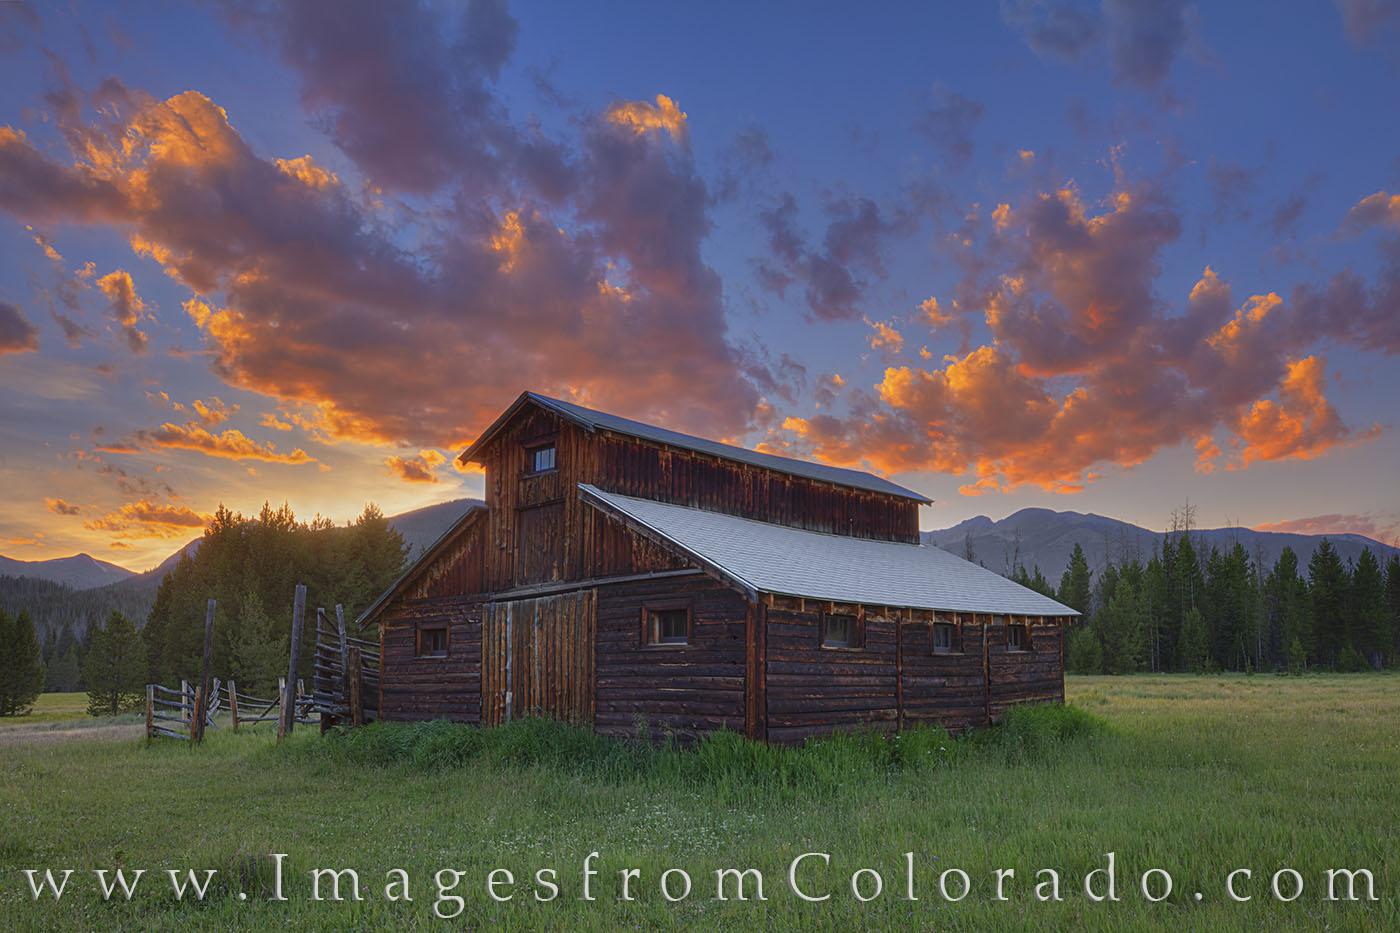 little buckaroo barn, betty dick, fred dick, rocky mountain national park, never summer mountains, Kawuneeche Valley, RMNP, sunset, summer, evening, barn, homestead, photo